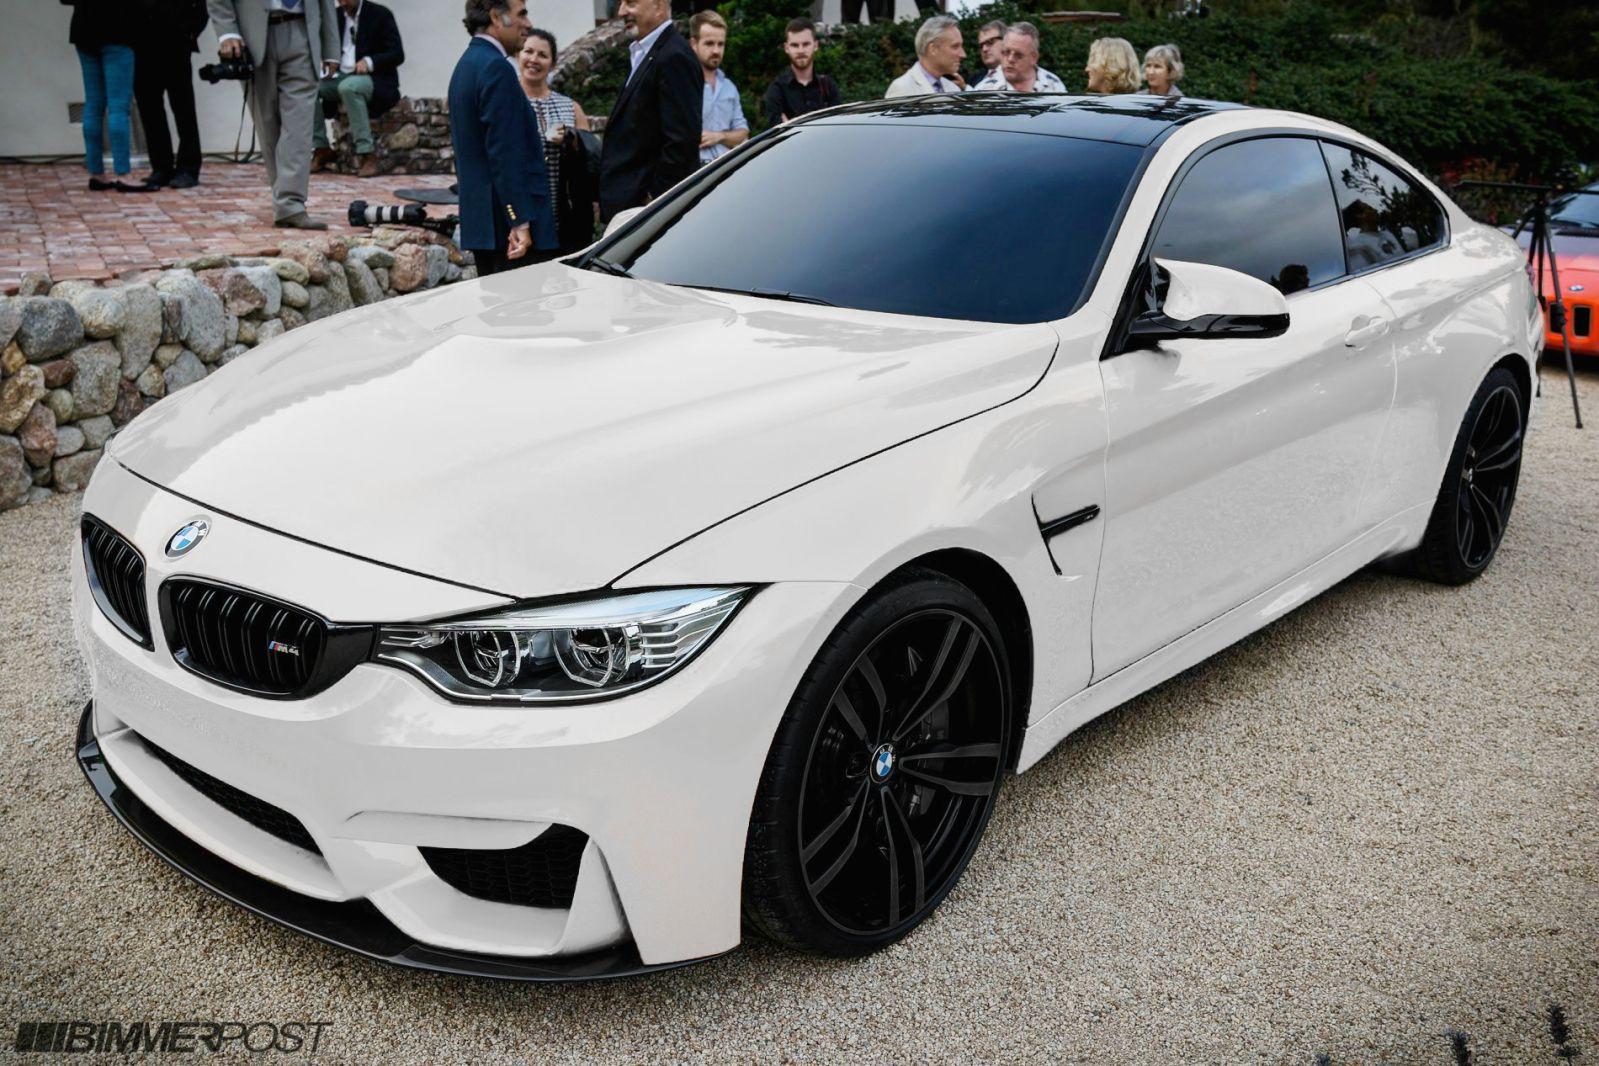 Bmw M4 White With Black Rims Whips Bmw M4 Bmw M4